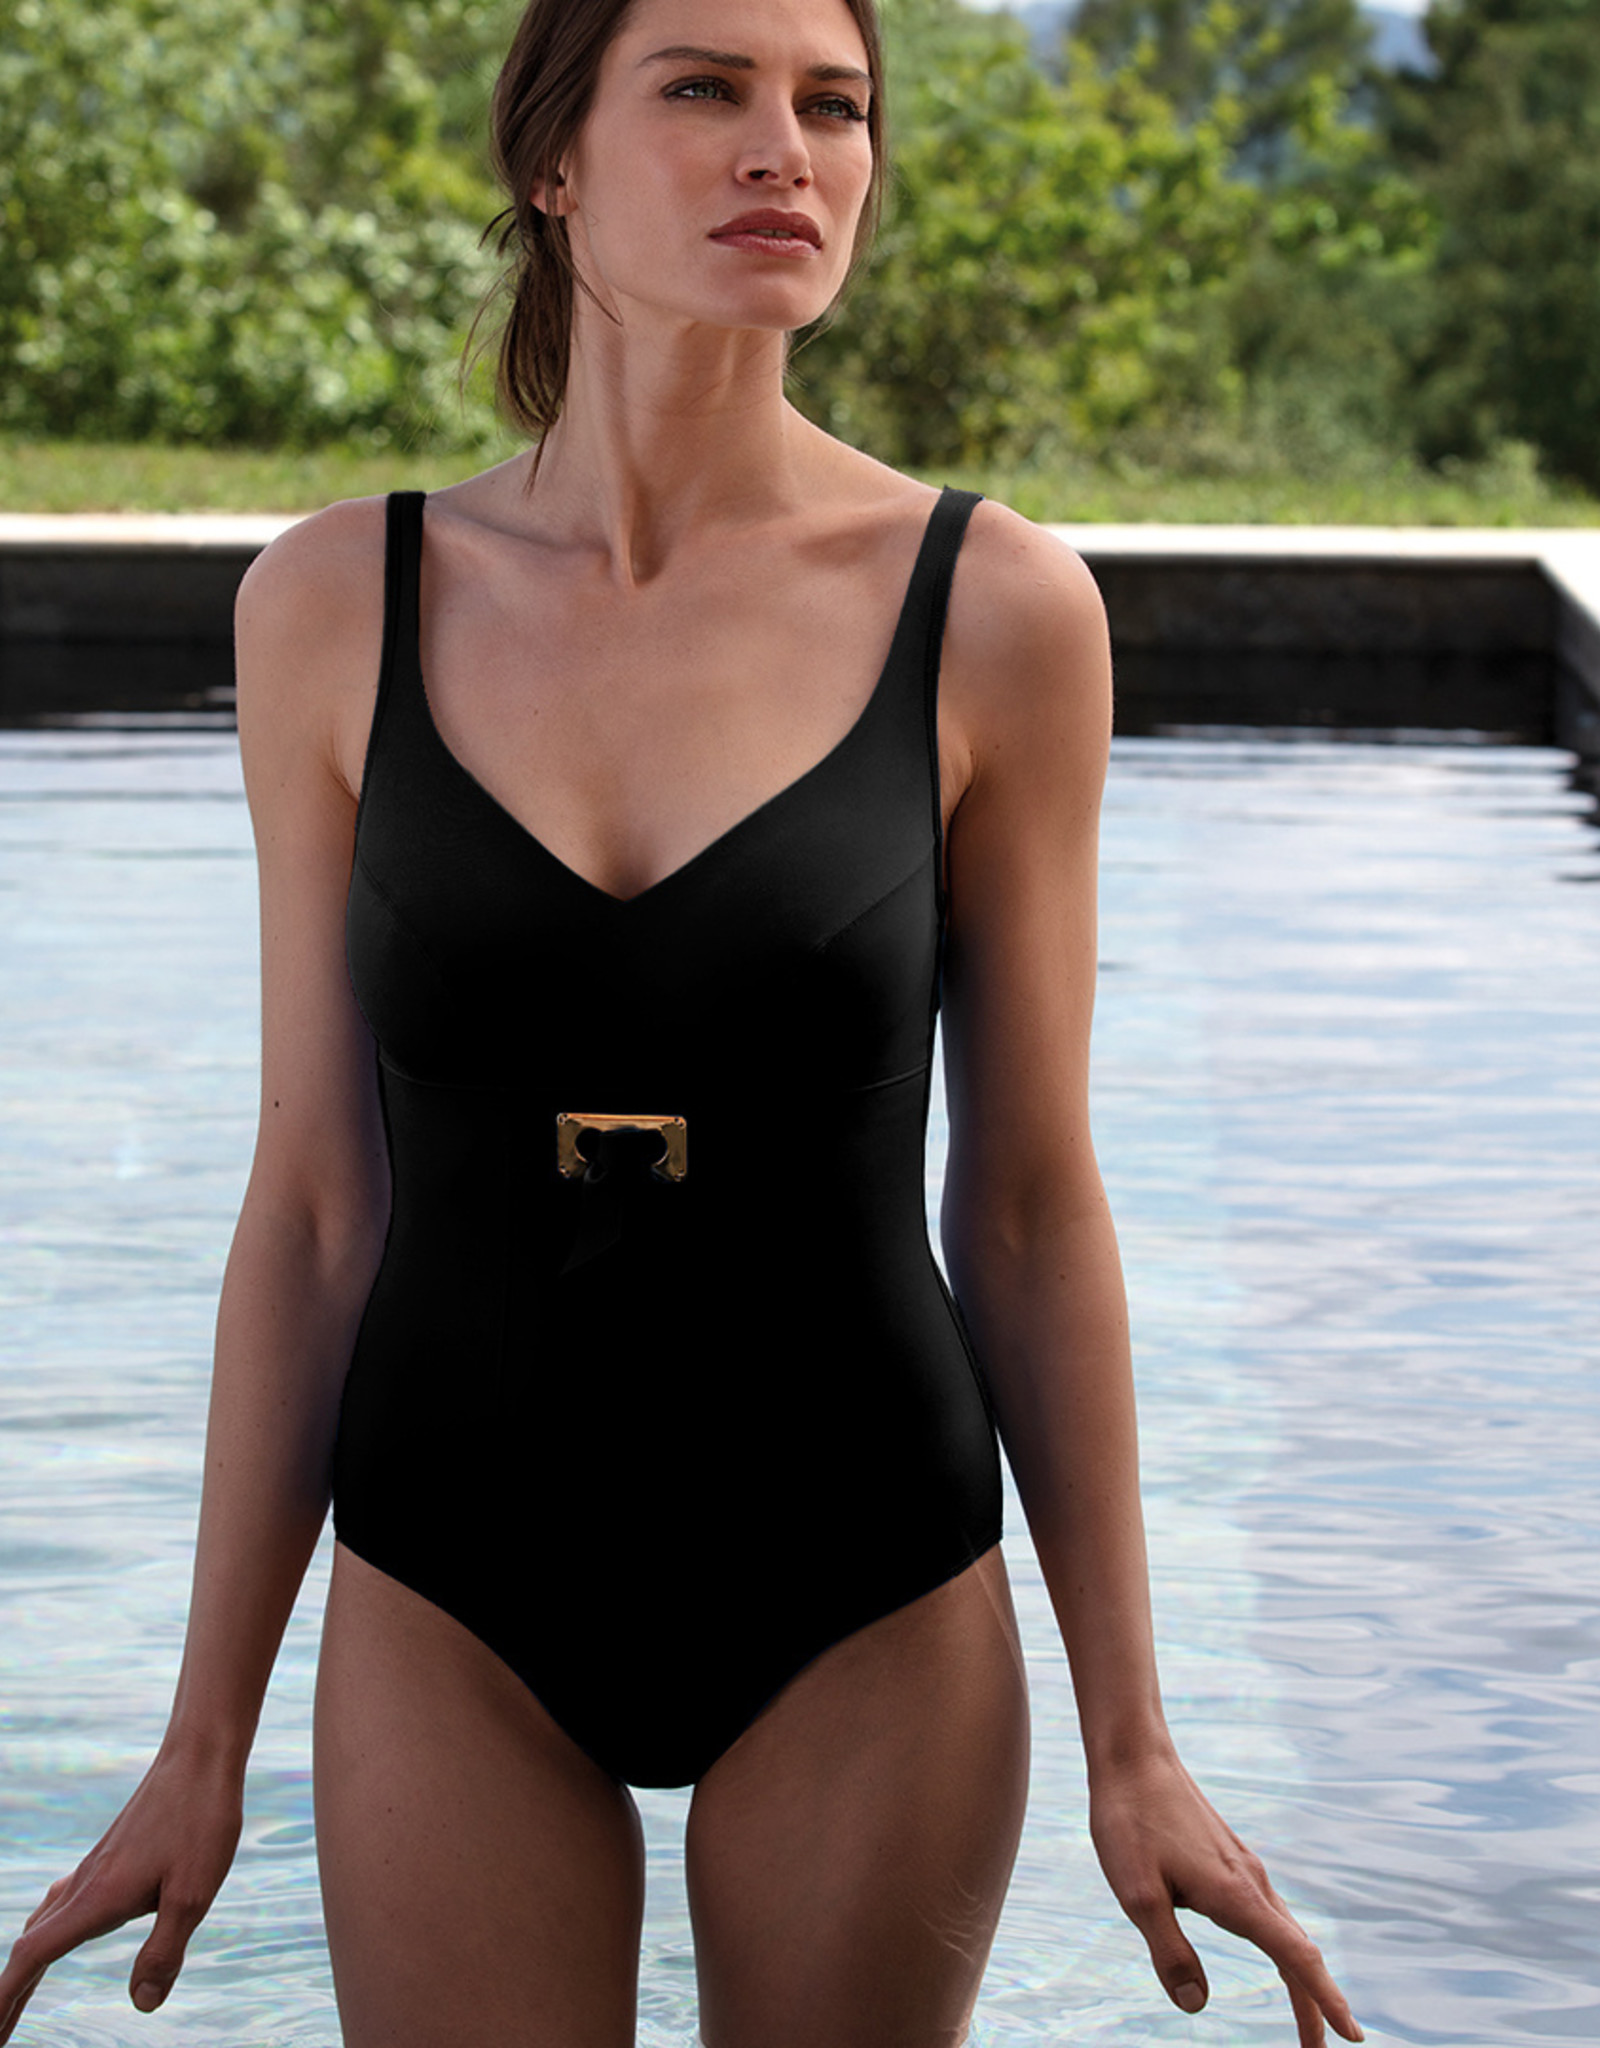 Empreinte Star Océan Swimsuit 2031TZ